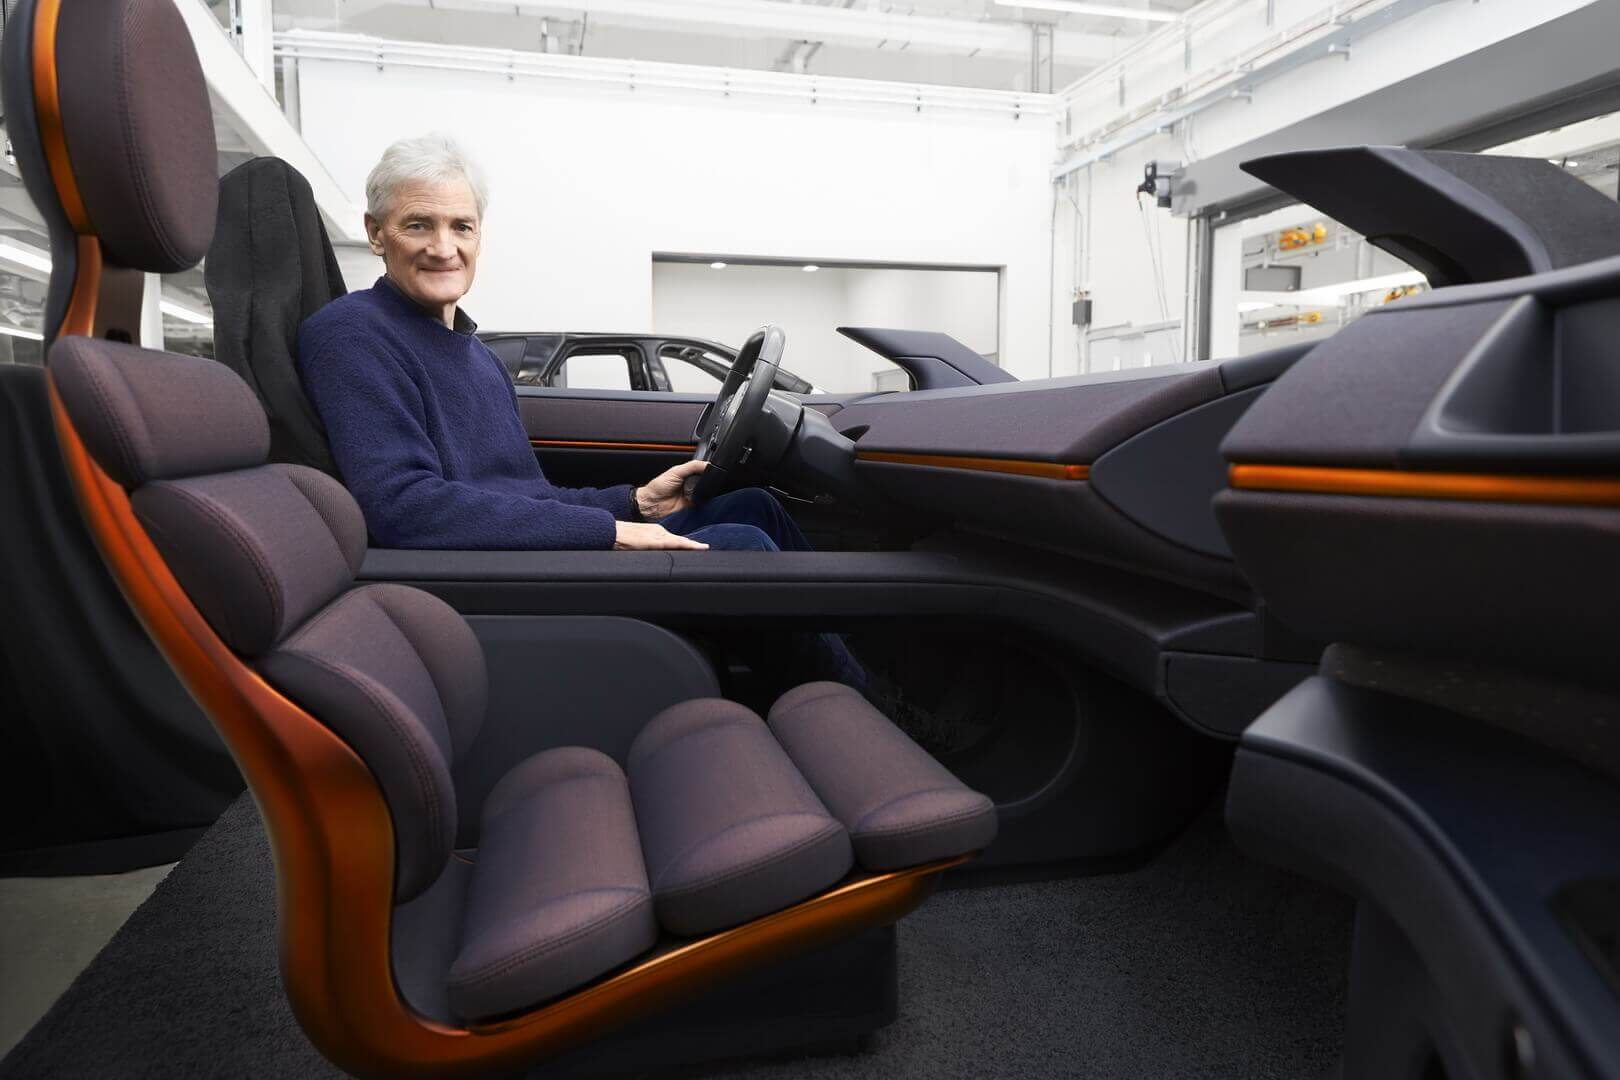 Джеймс Дайсон в прототипе электромобиля